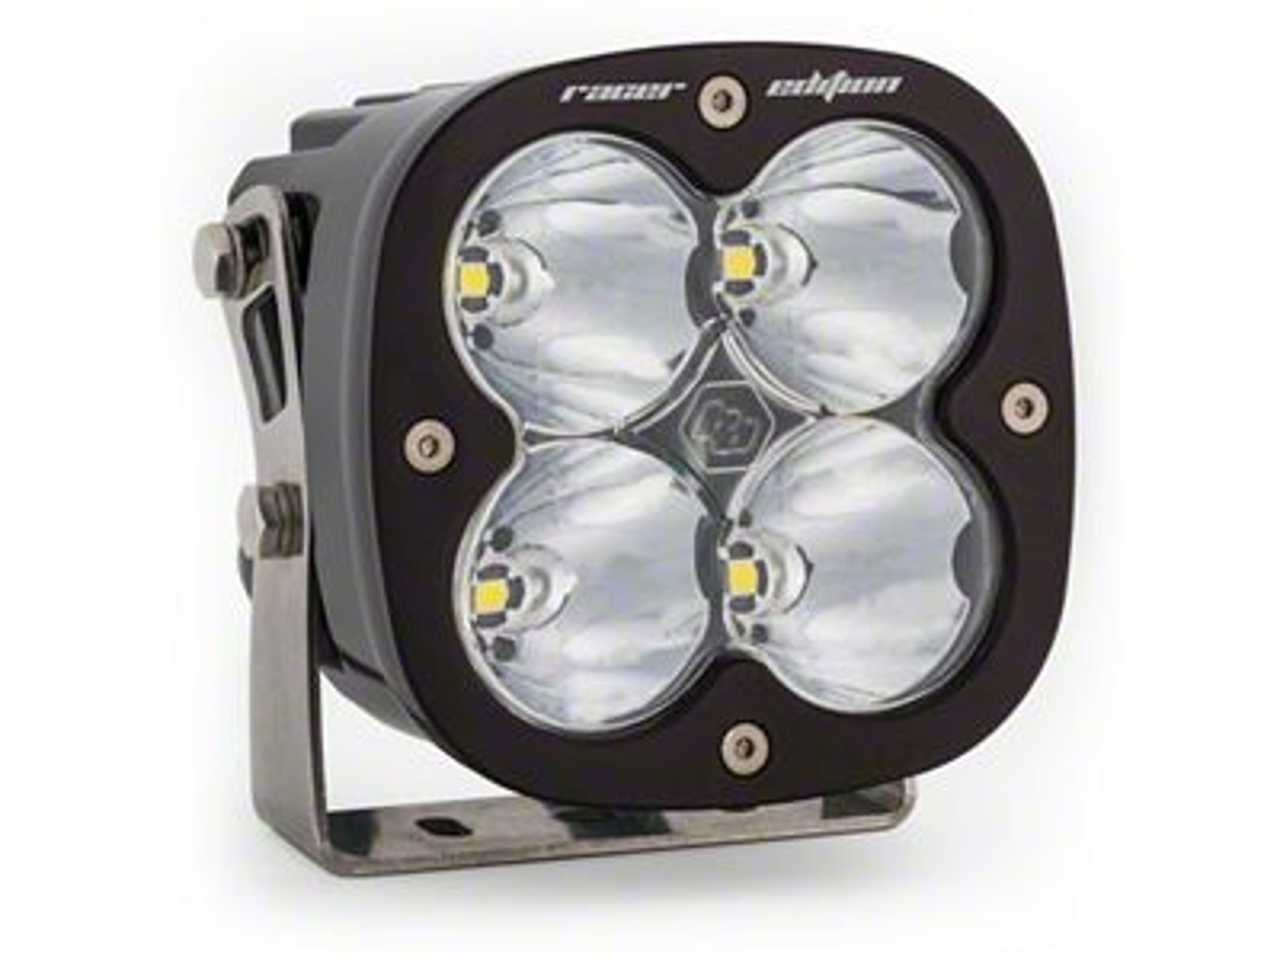 Baja Designs XL Racer Edition LED Light - High Speed Spot Beam